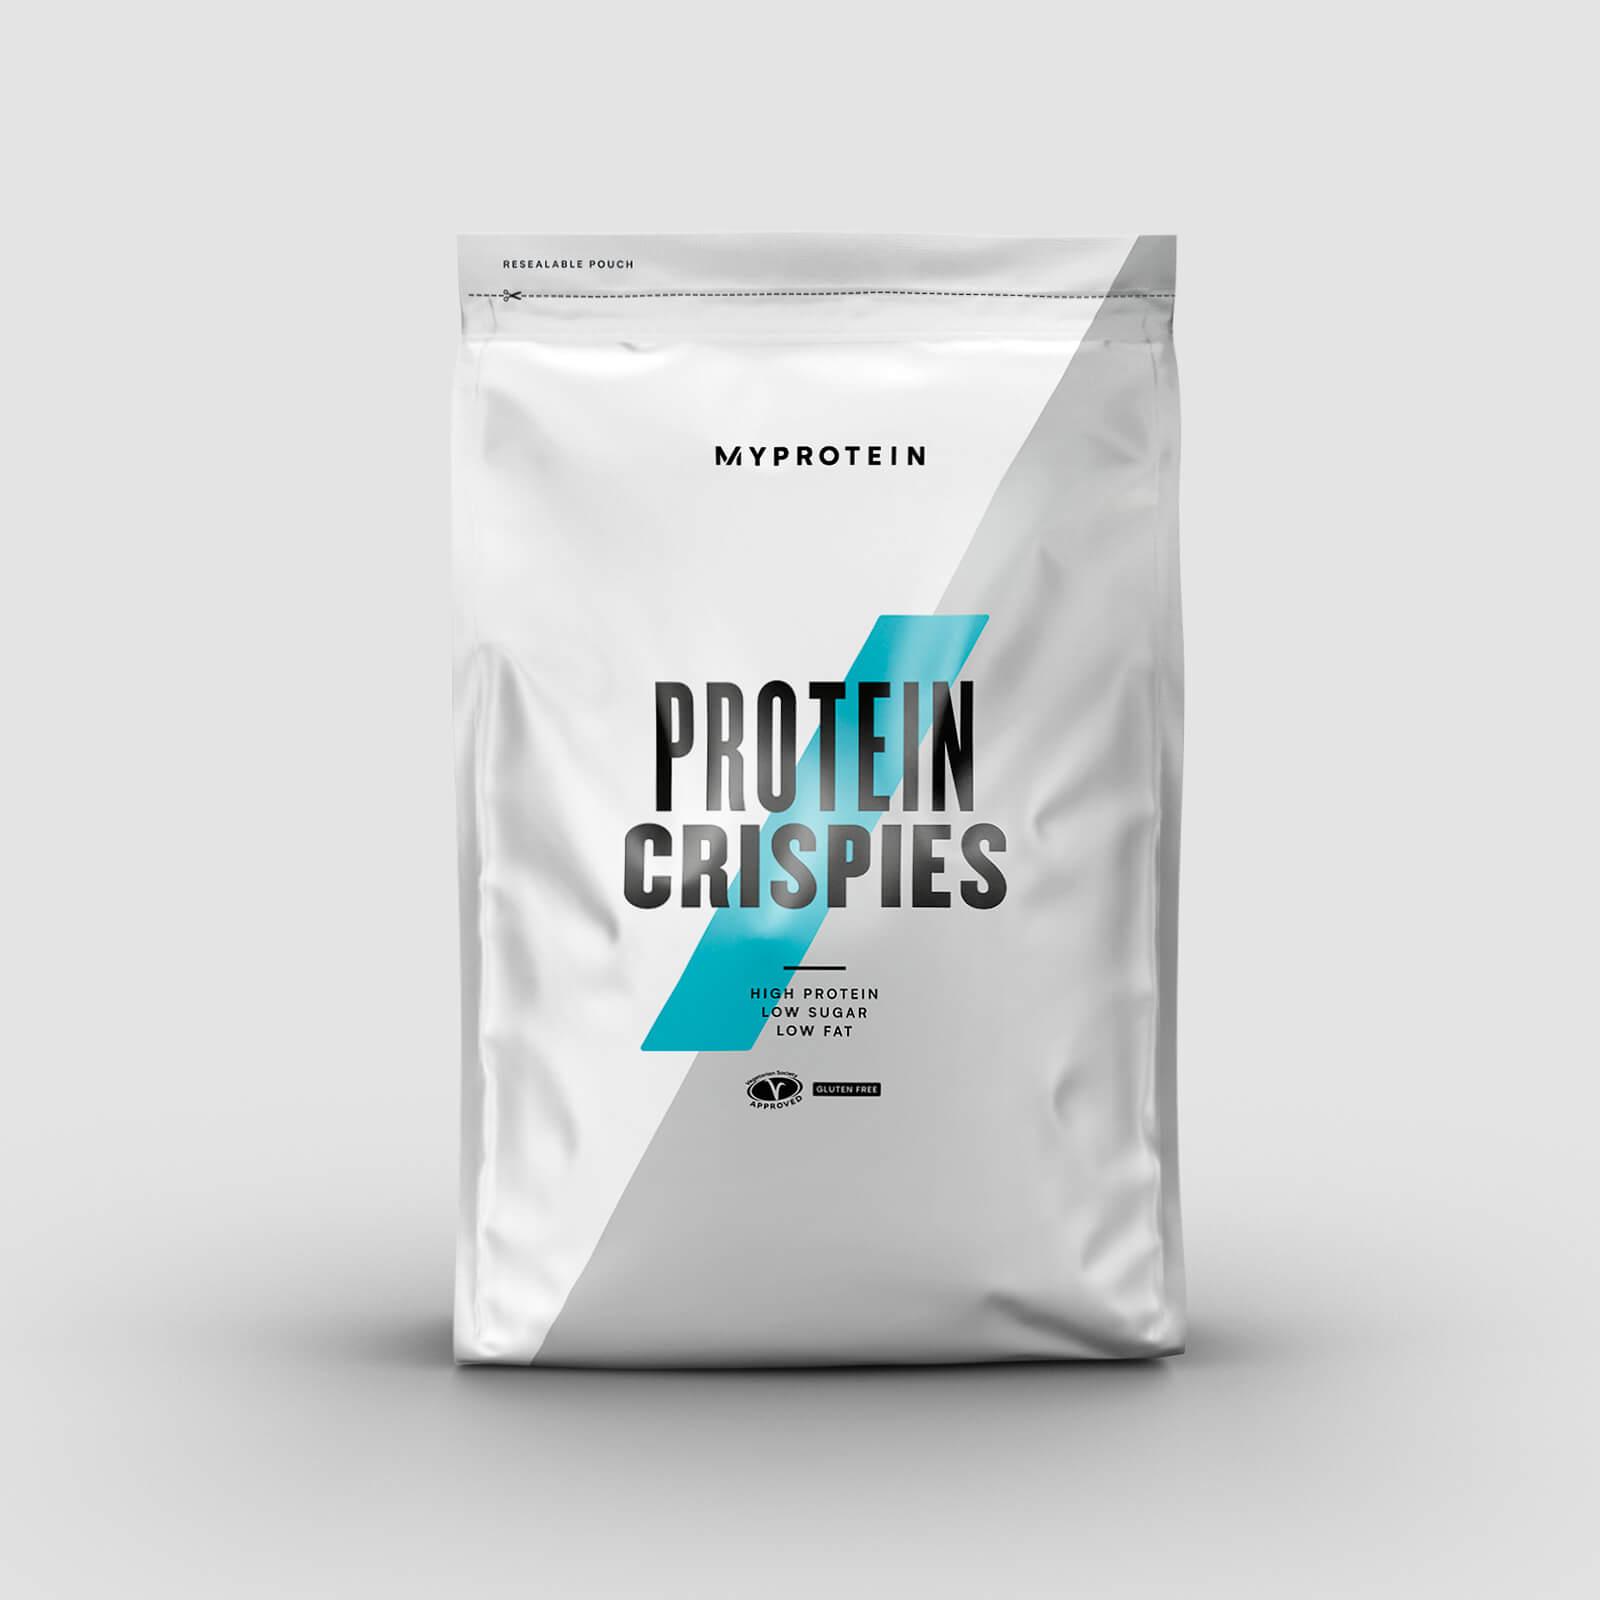 Myprotein Céréales Protéinées - 1500g - Sans arôme ajouté